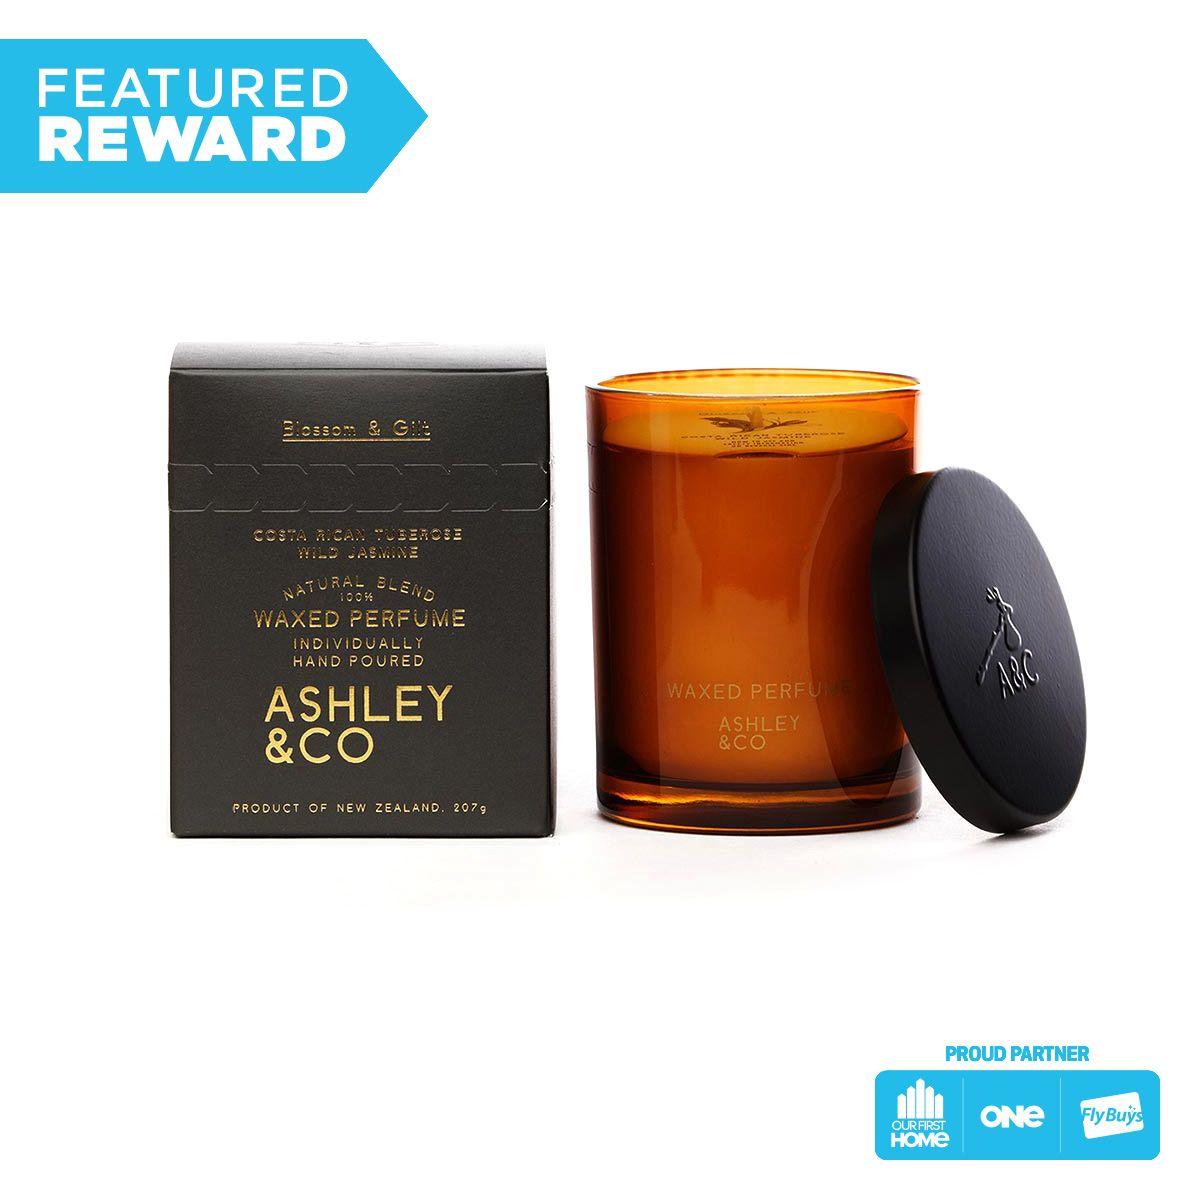 Ashley and co waxed perfume flybuysnz ashleyco 225points ofhnz